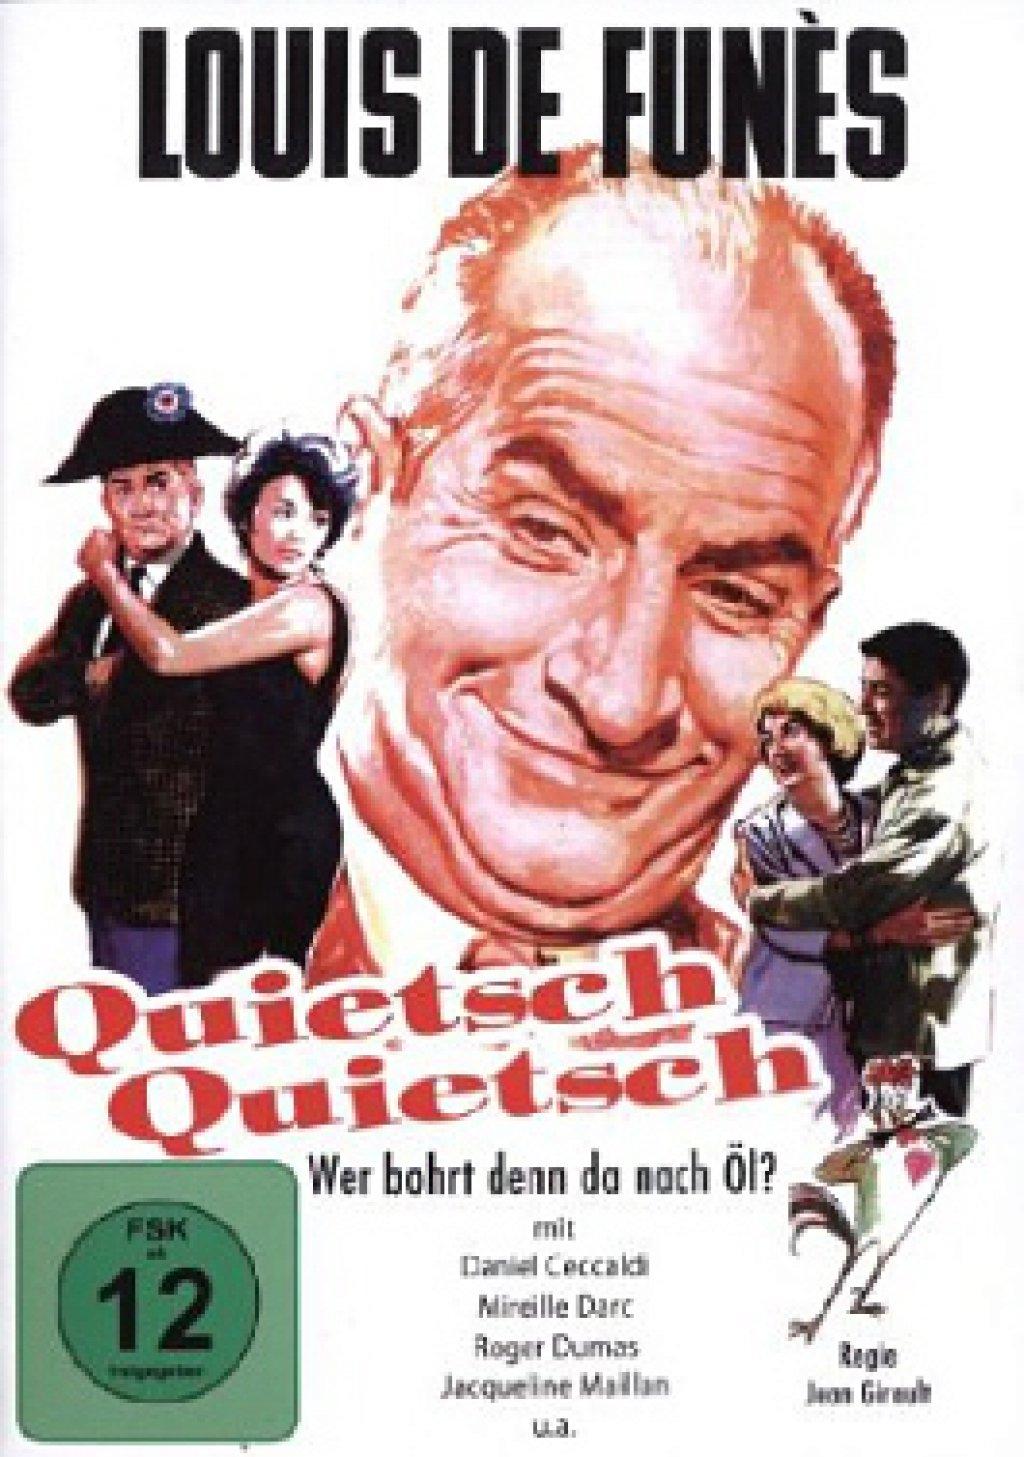 Quietsch Quietsch, wer bohrt denn da nach Öl? (DVD)